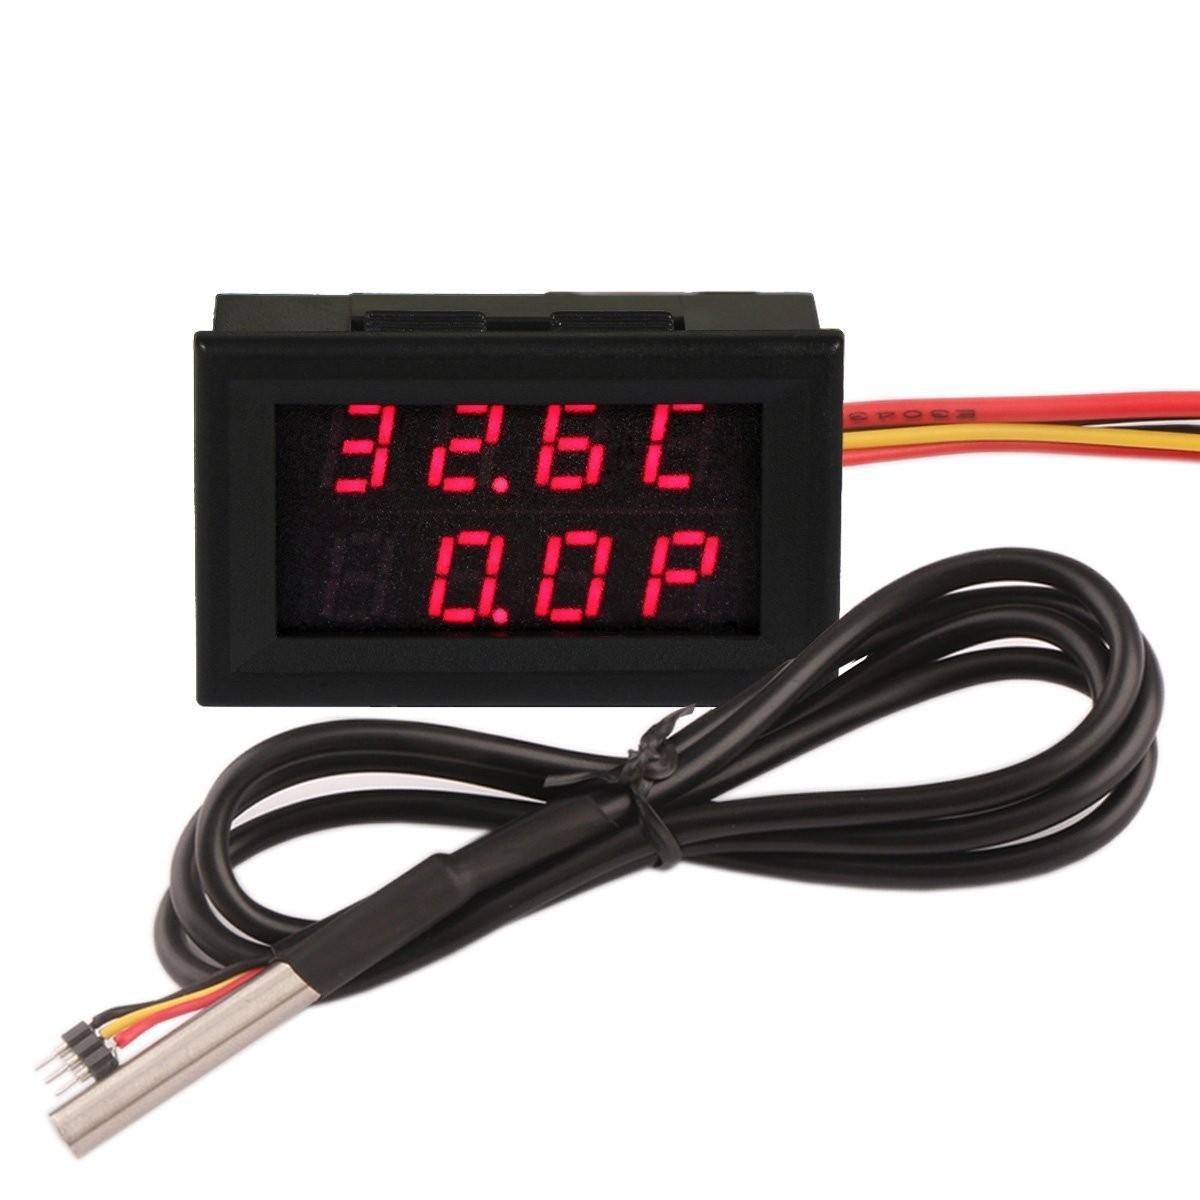 Riorand 026 Dc 0 33v 12v 3a Digital Car Volt Ampere Watt Temp Circuit Diagram Meter Wiring Zoom